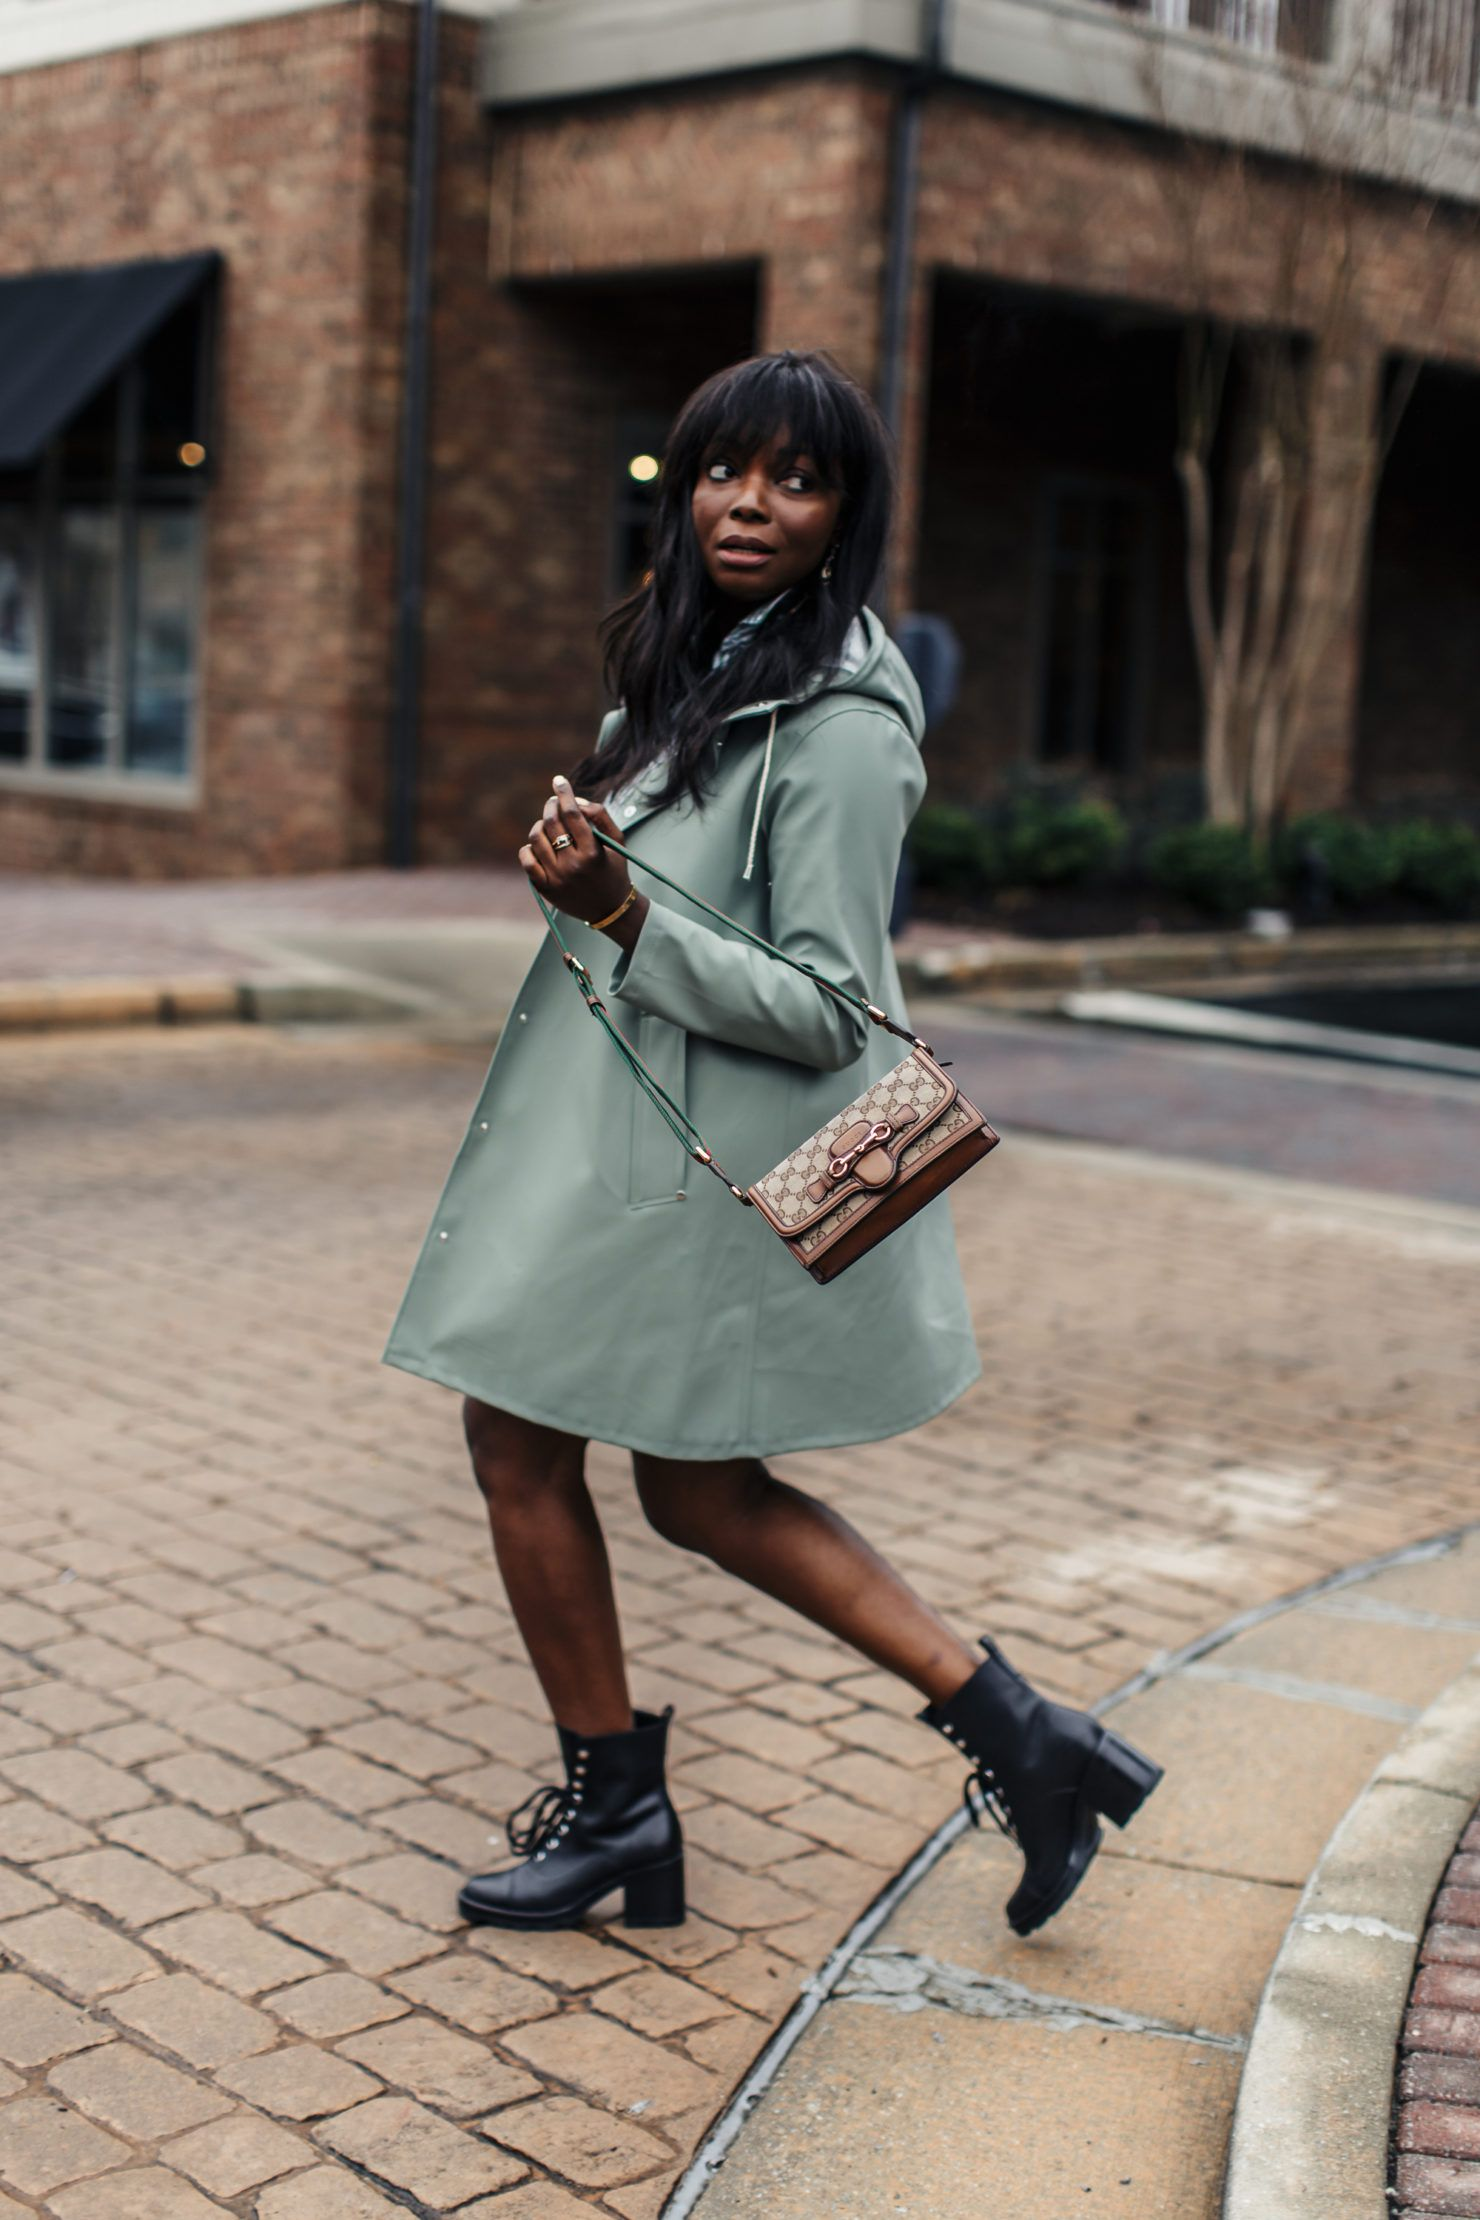 e476bedeae15 Rainy Day Outfits & Street Style: Stutterheim Mosebacke Rain Jacket on Fashion  Blogger | MILLENNIELLE Lifestyle & Fashion Blog